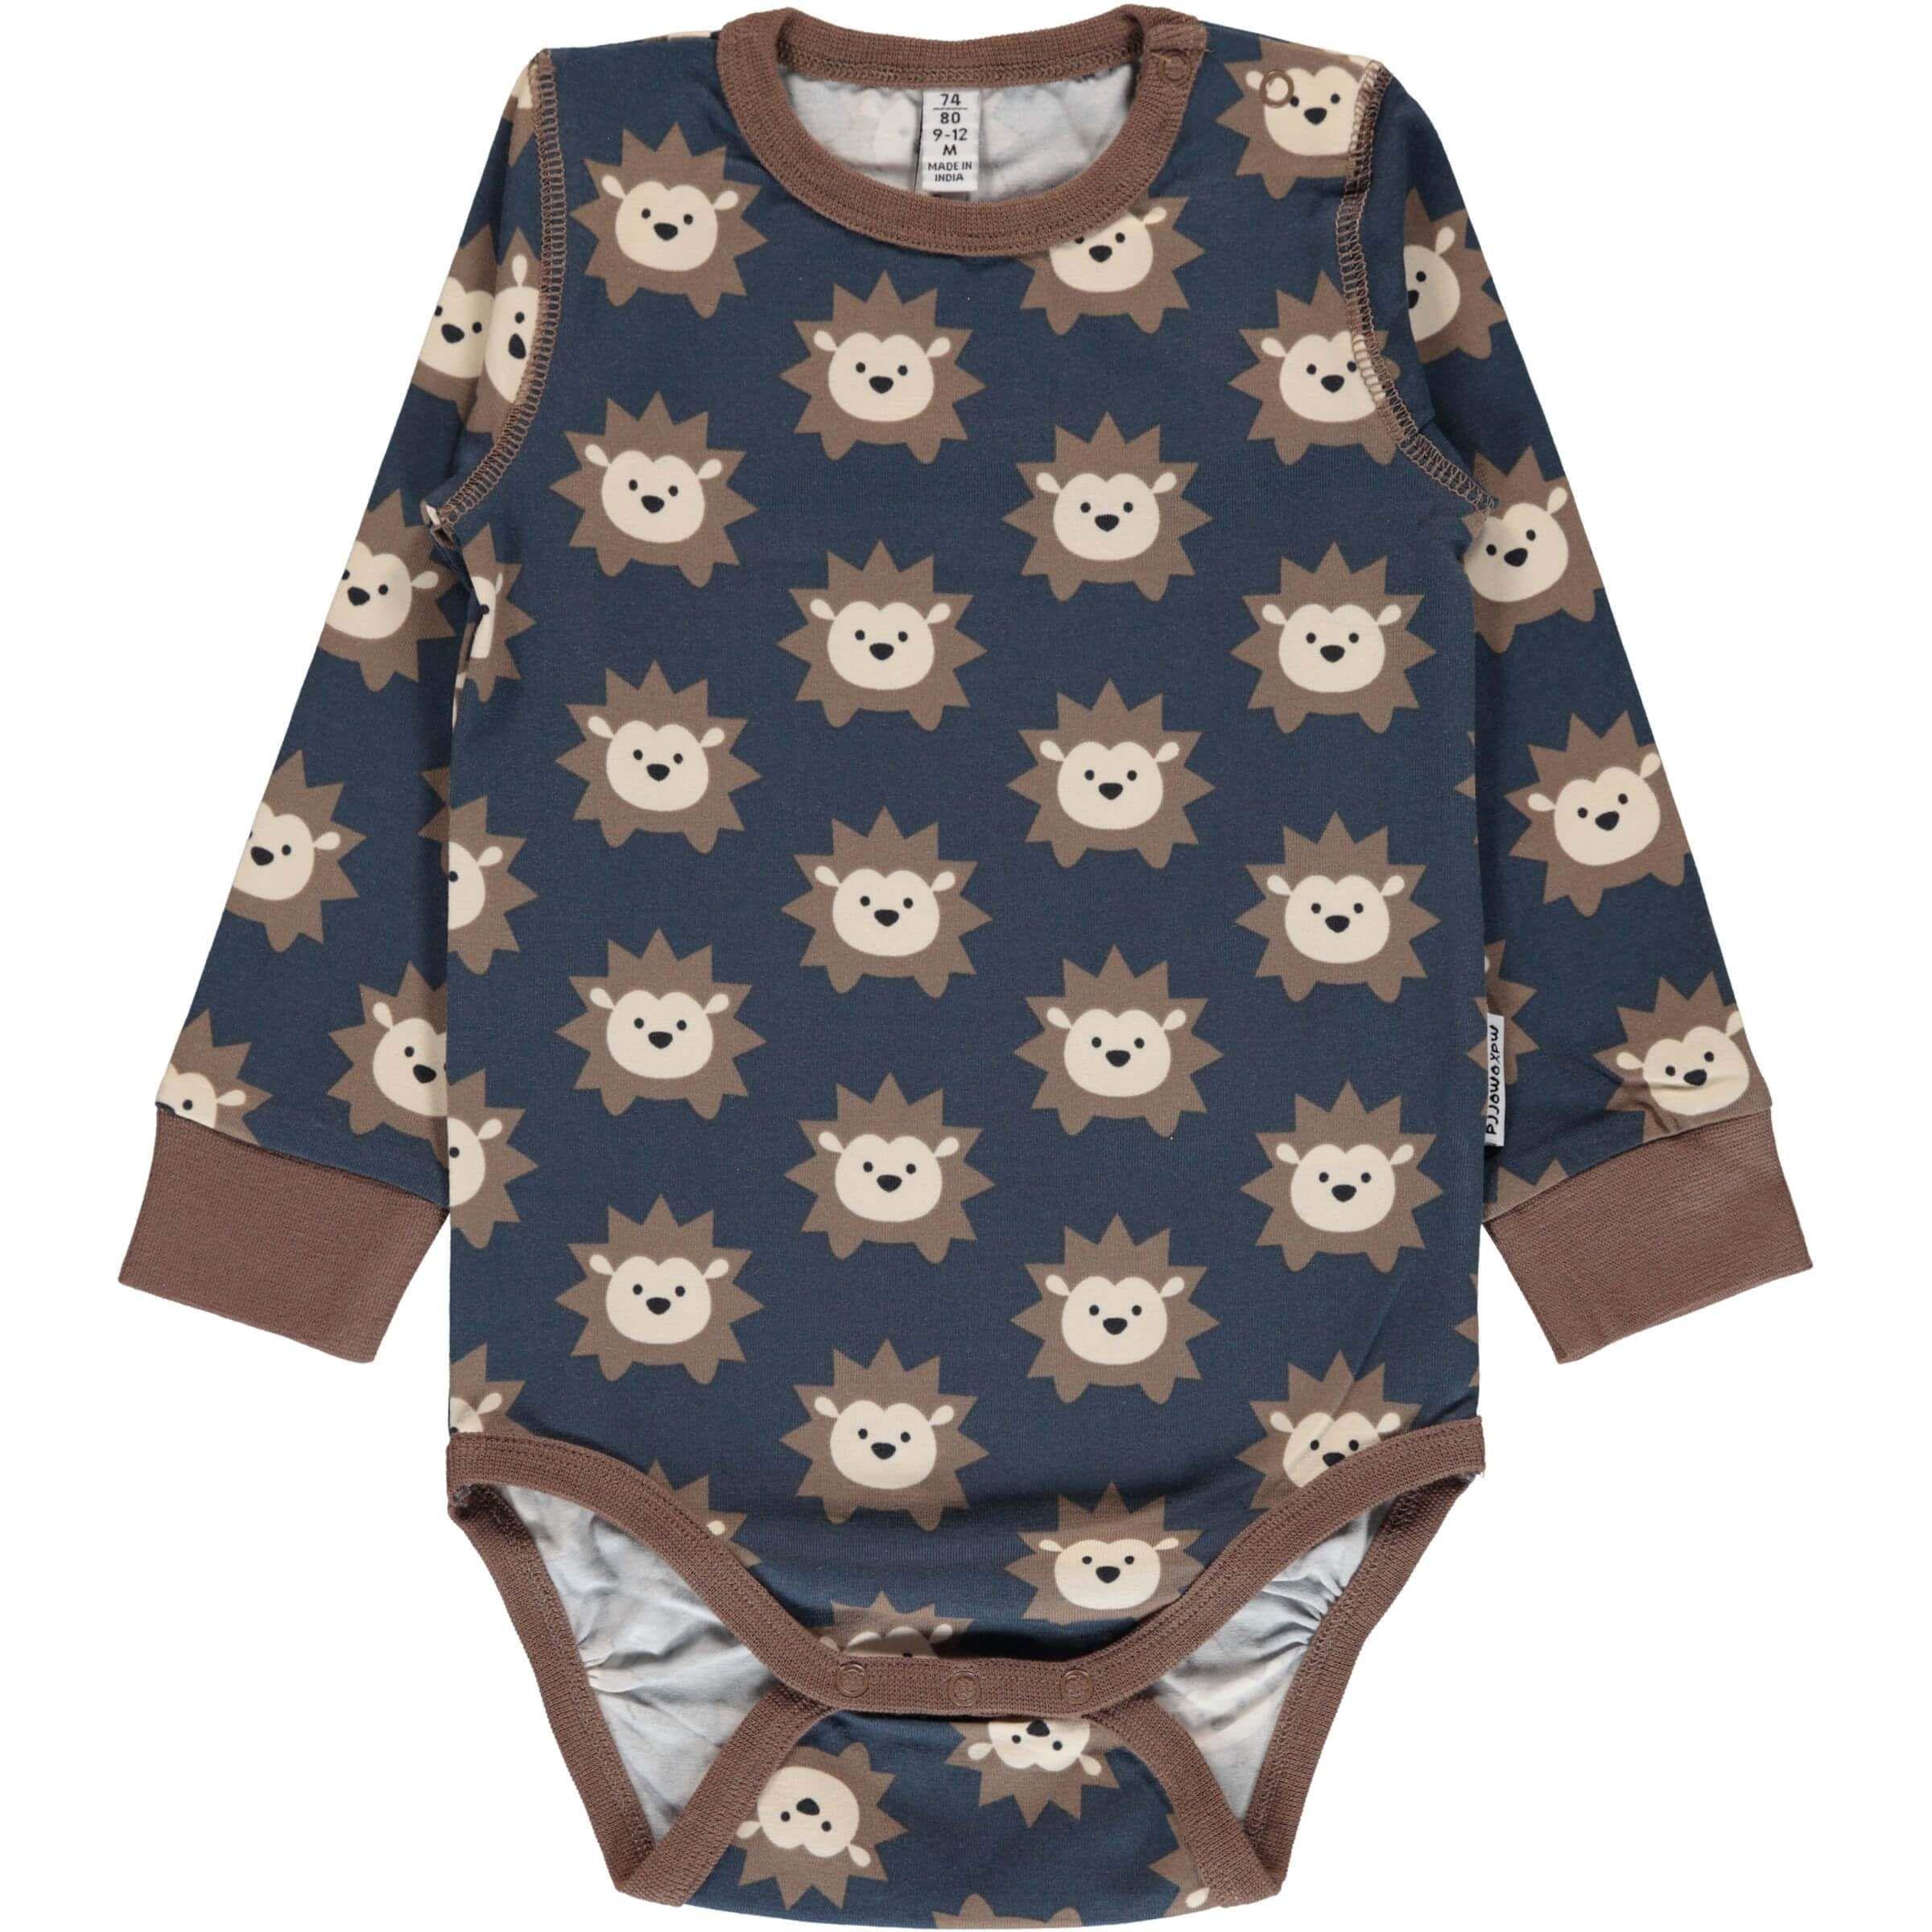 08278ef0d78b35 Hedgehog Long Sleeve Onesie – Modern Rascals. From Maxomorra